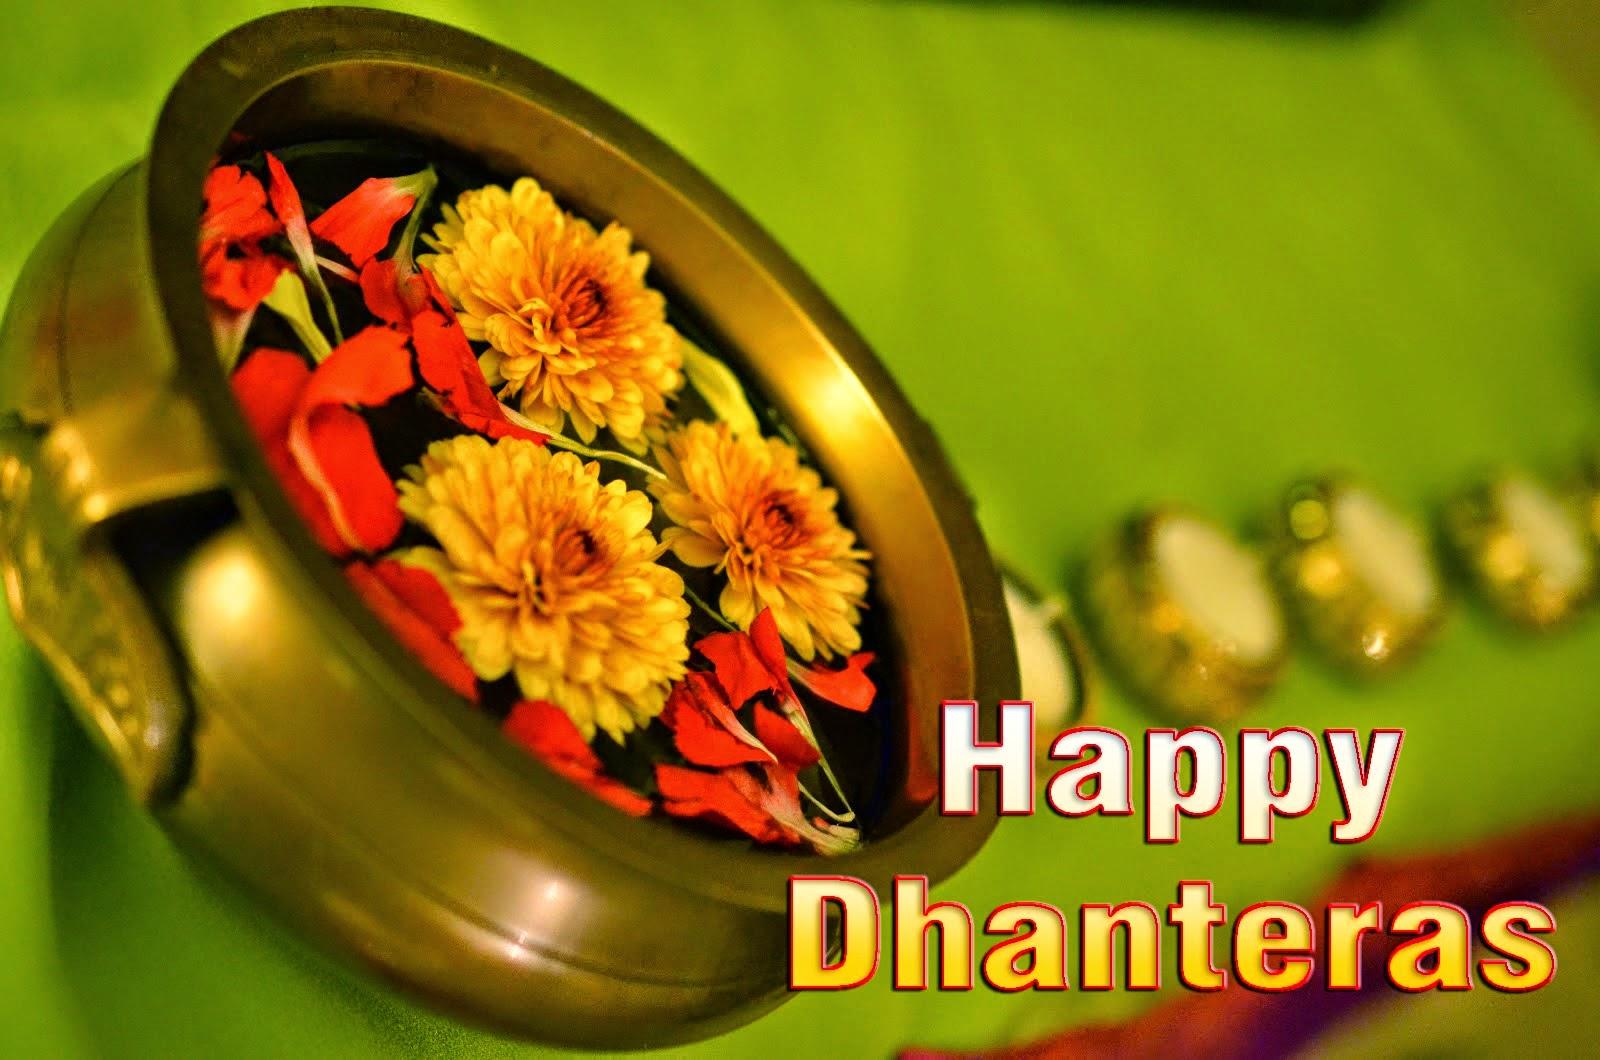 Best Happy dhanteras Festival HD Images 2014